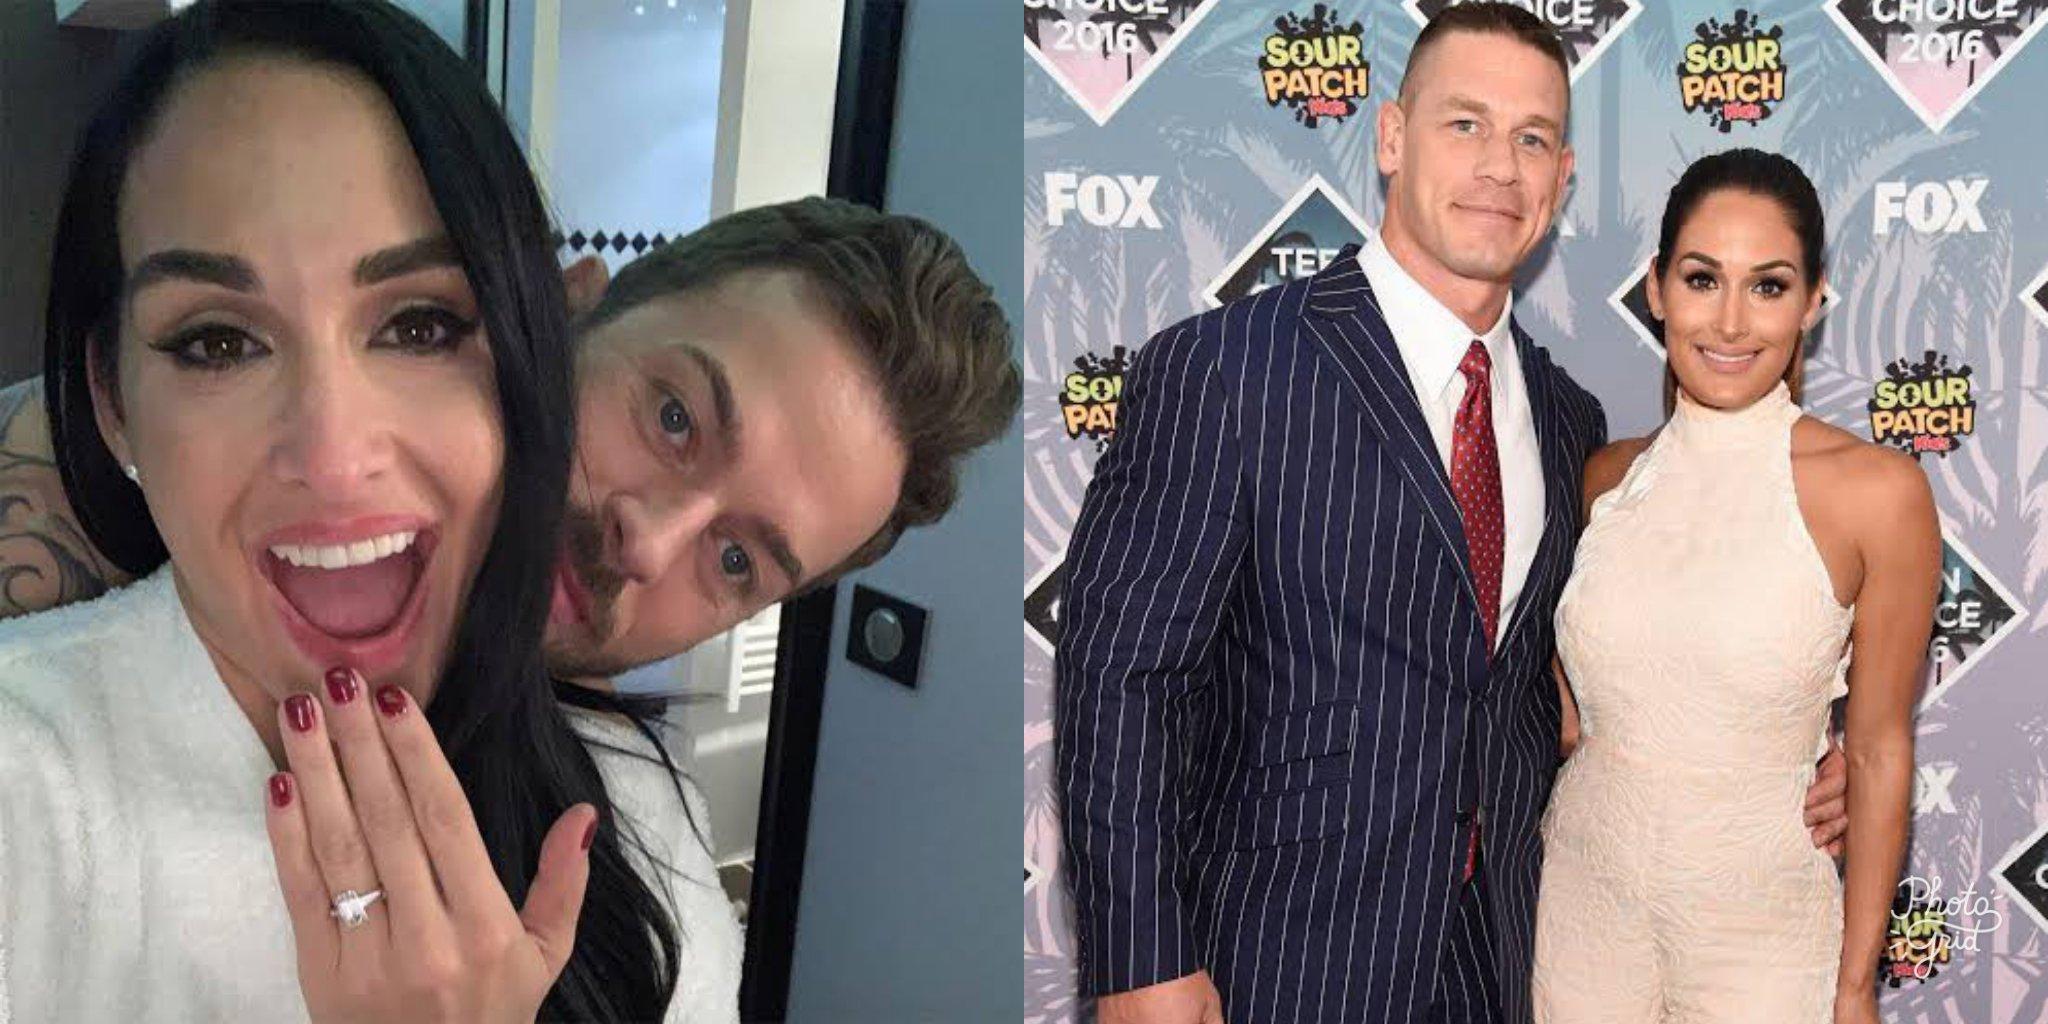 Nikki Bella Announces Her Engagement To Her Dancer Boyfriend Artem Chigvintsev After Ditching John Cena